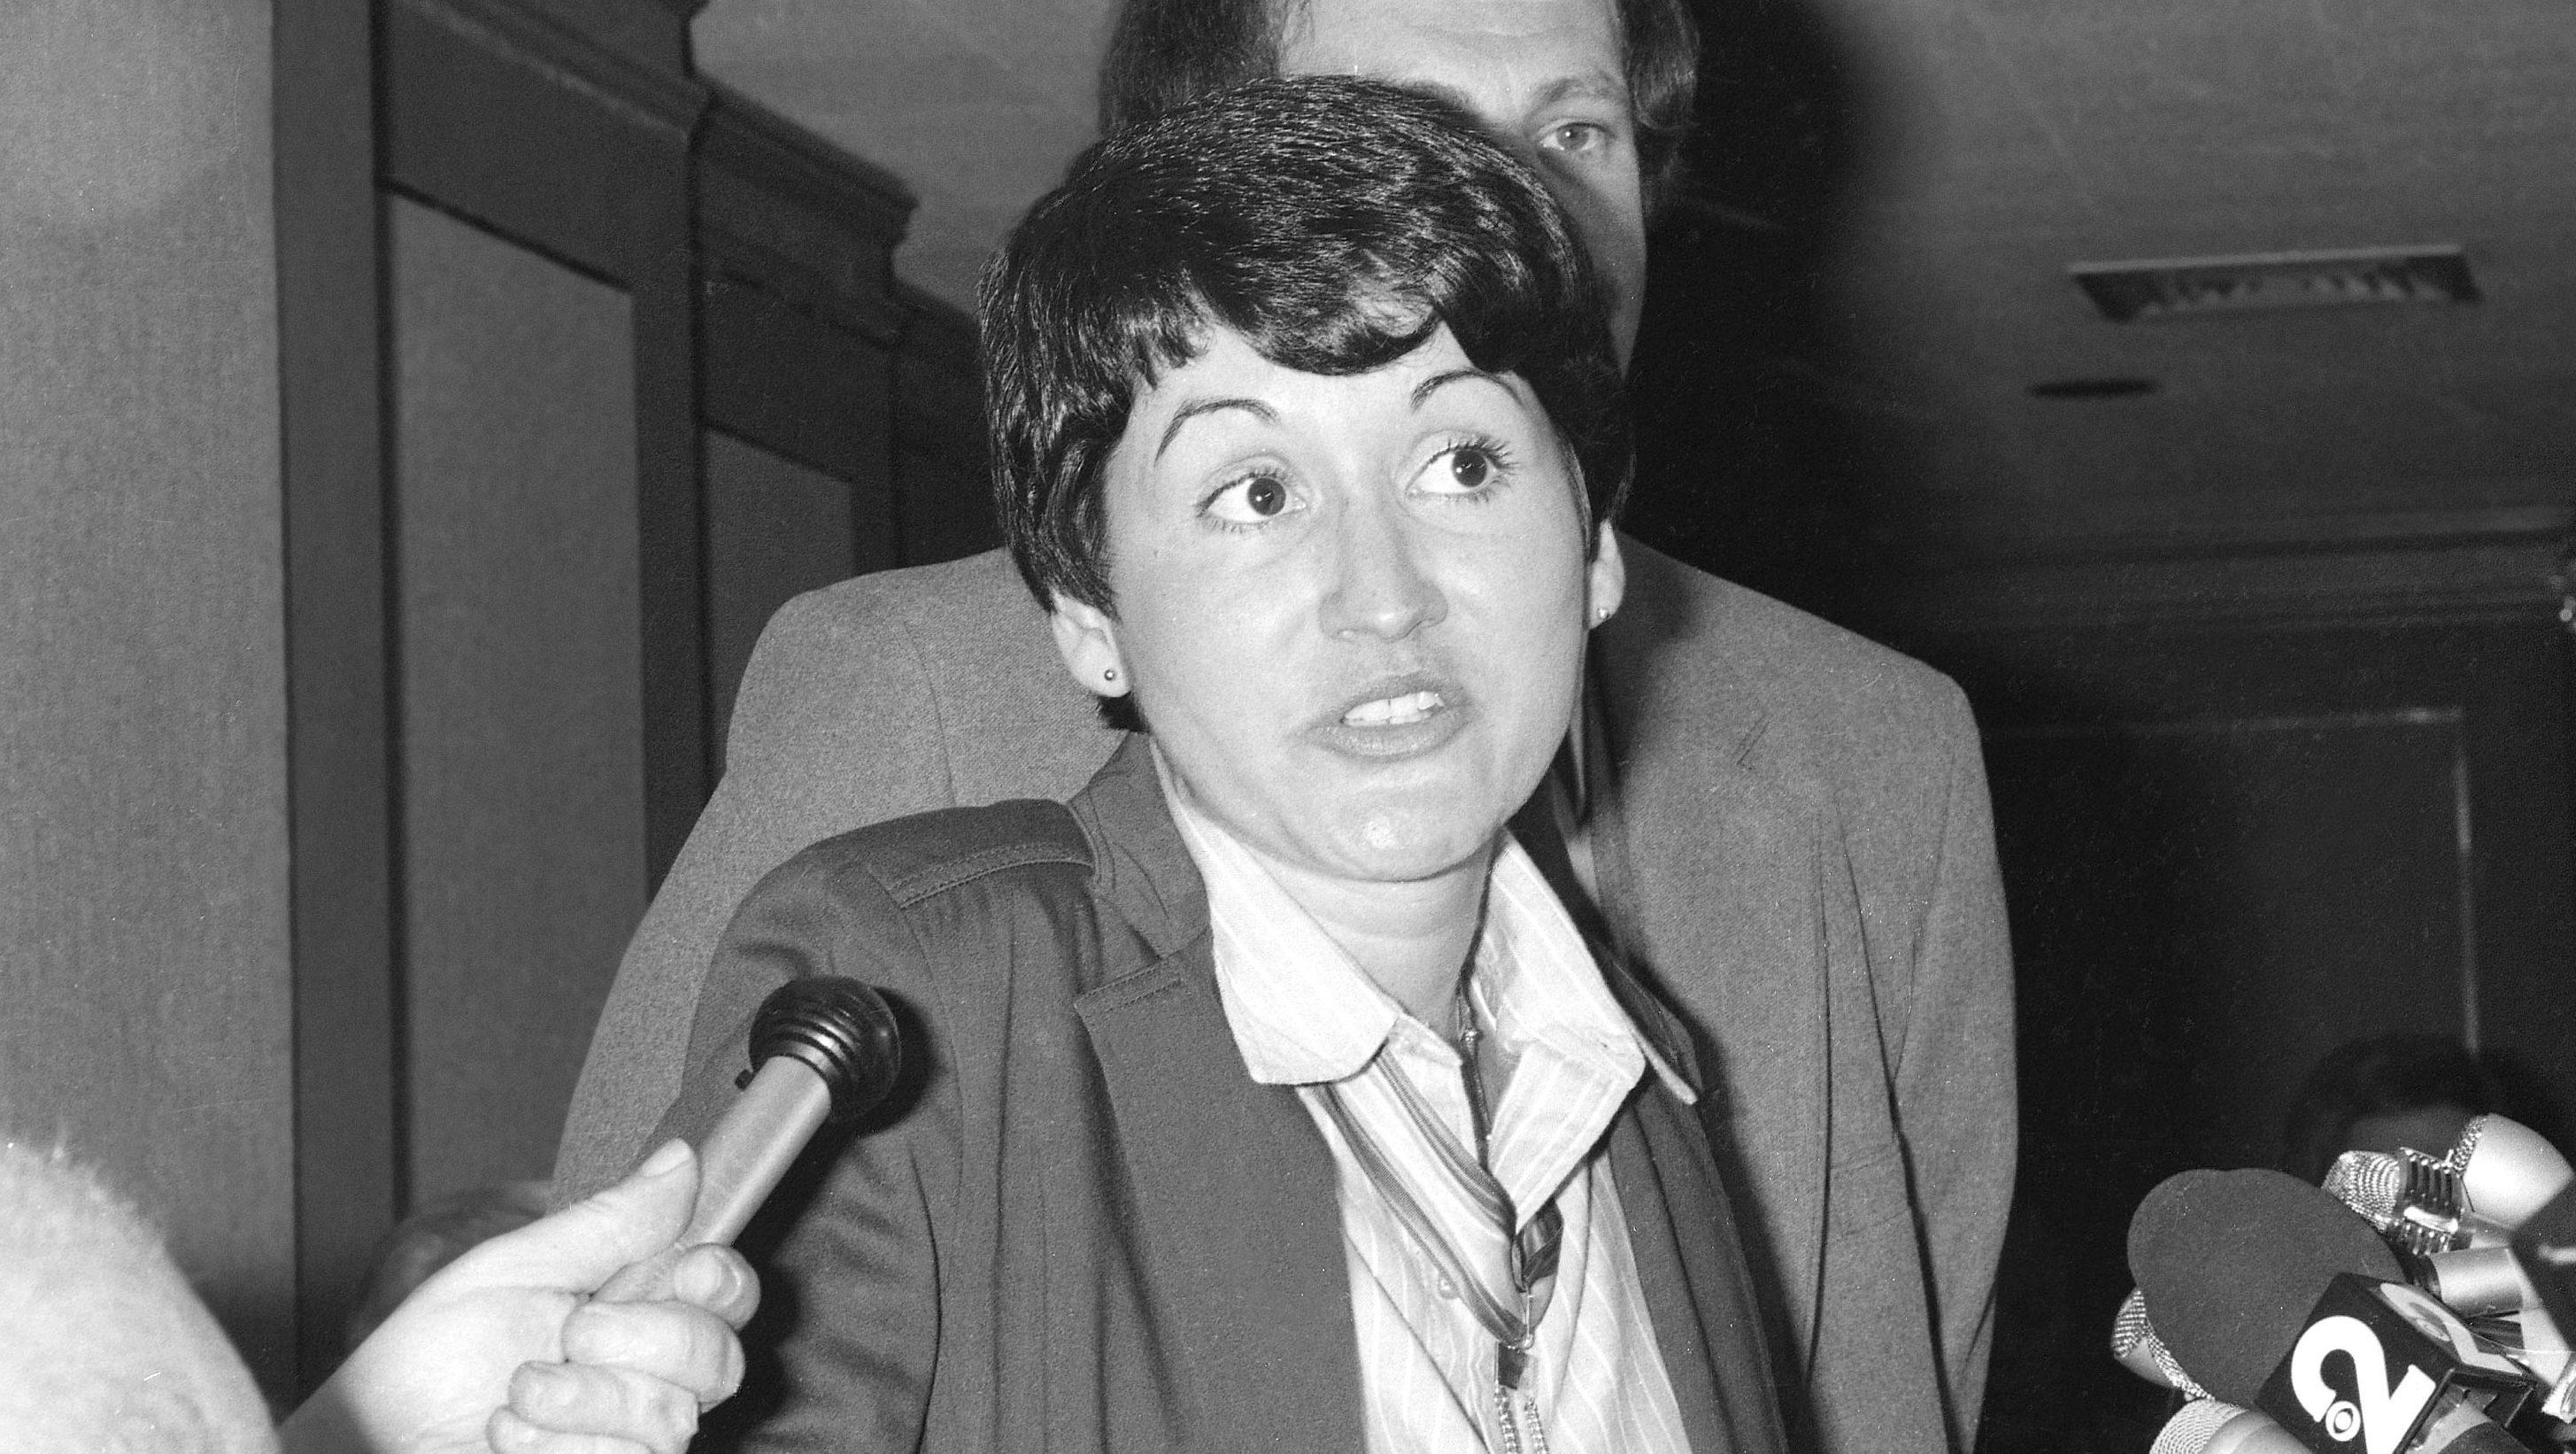 Rosie Ruiz at a press conference